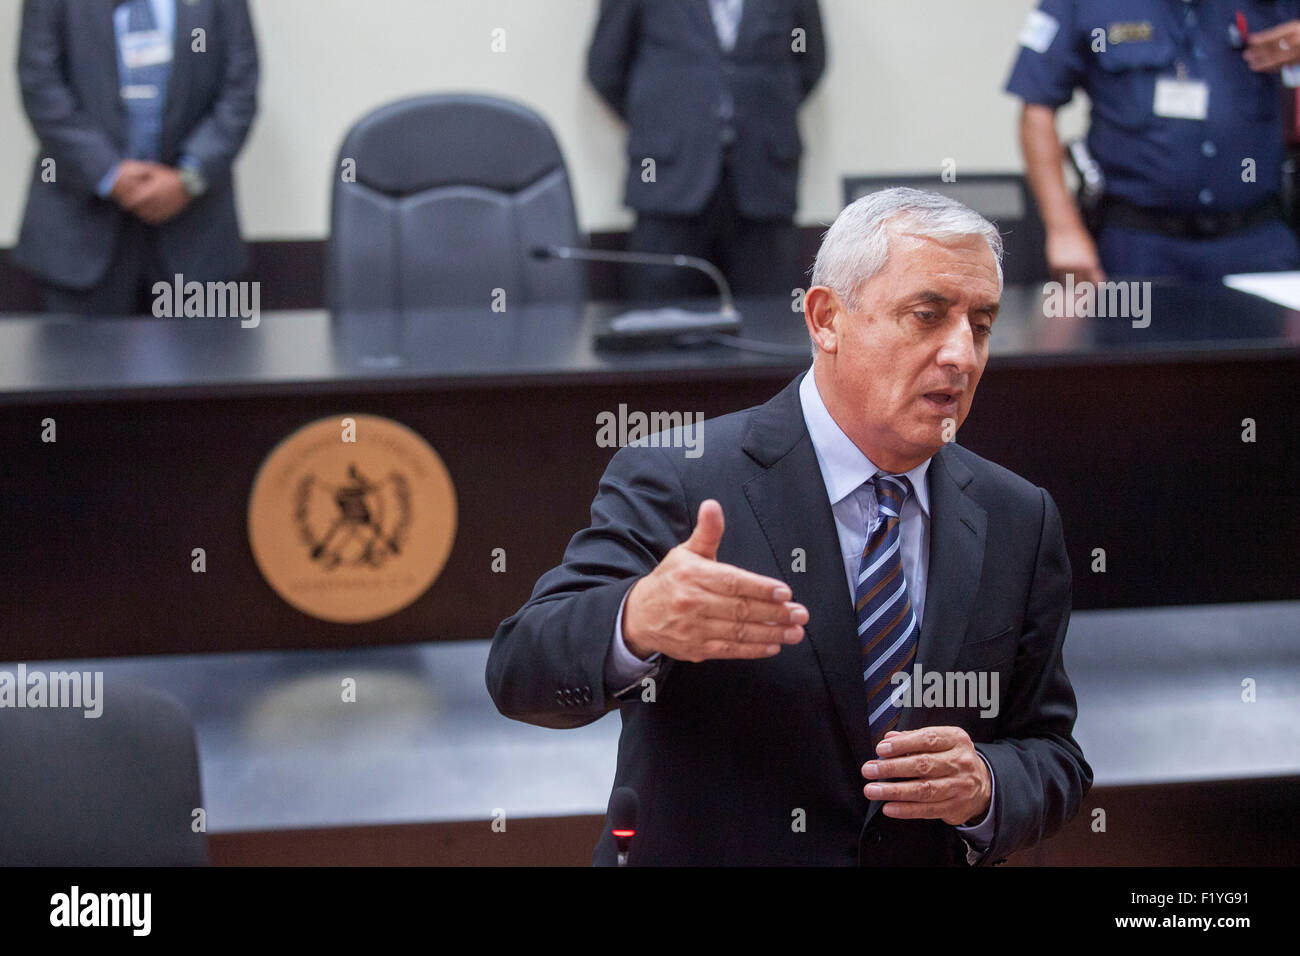 Guatemala City, Guatemala. 8th Sep, 2015. Former Guatemalan president Otto Perez Molina offers declarations at the - Stock Image